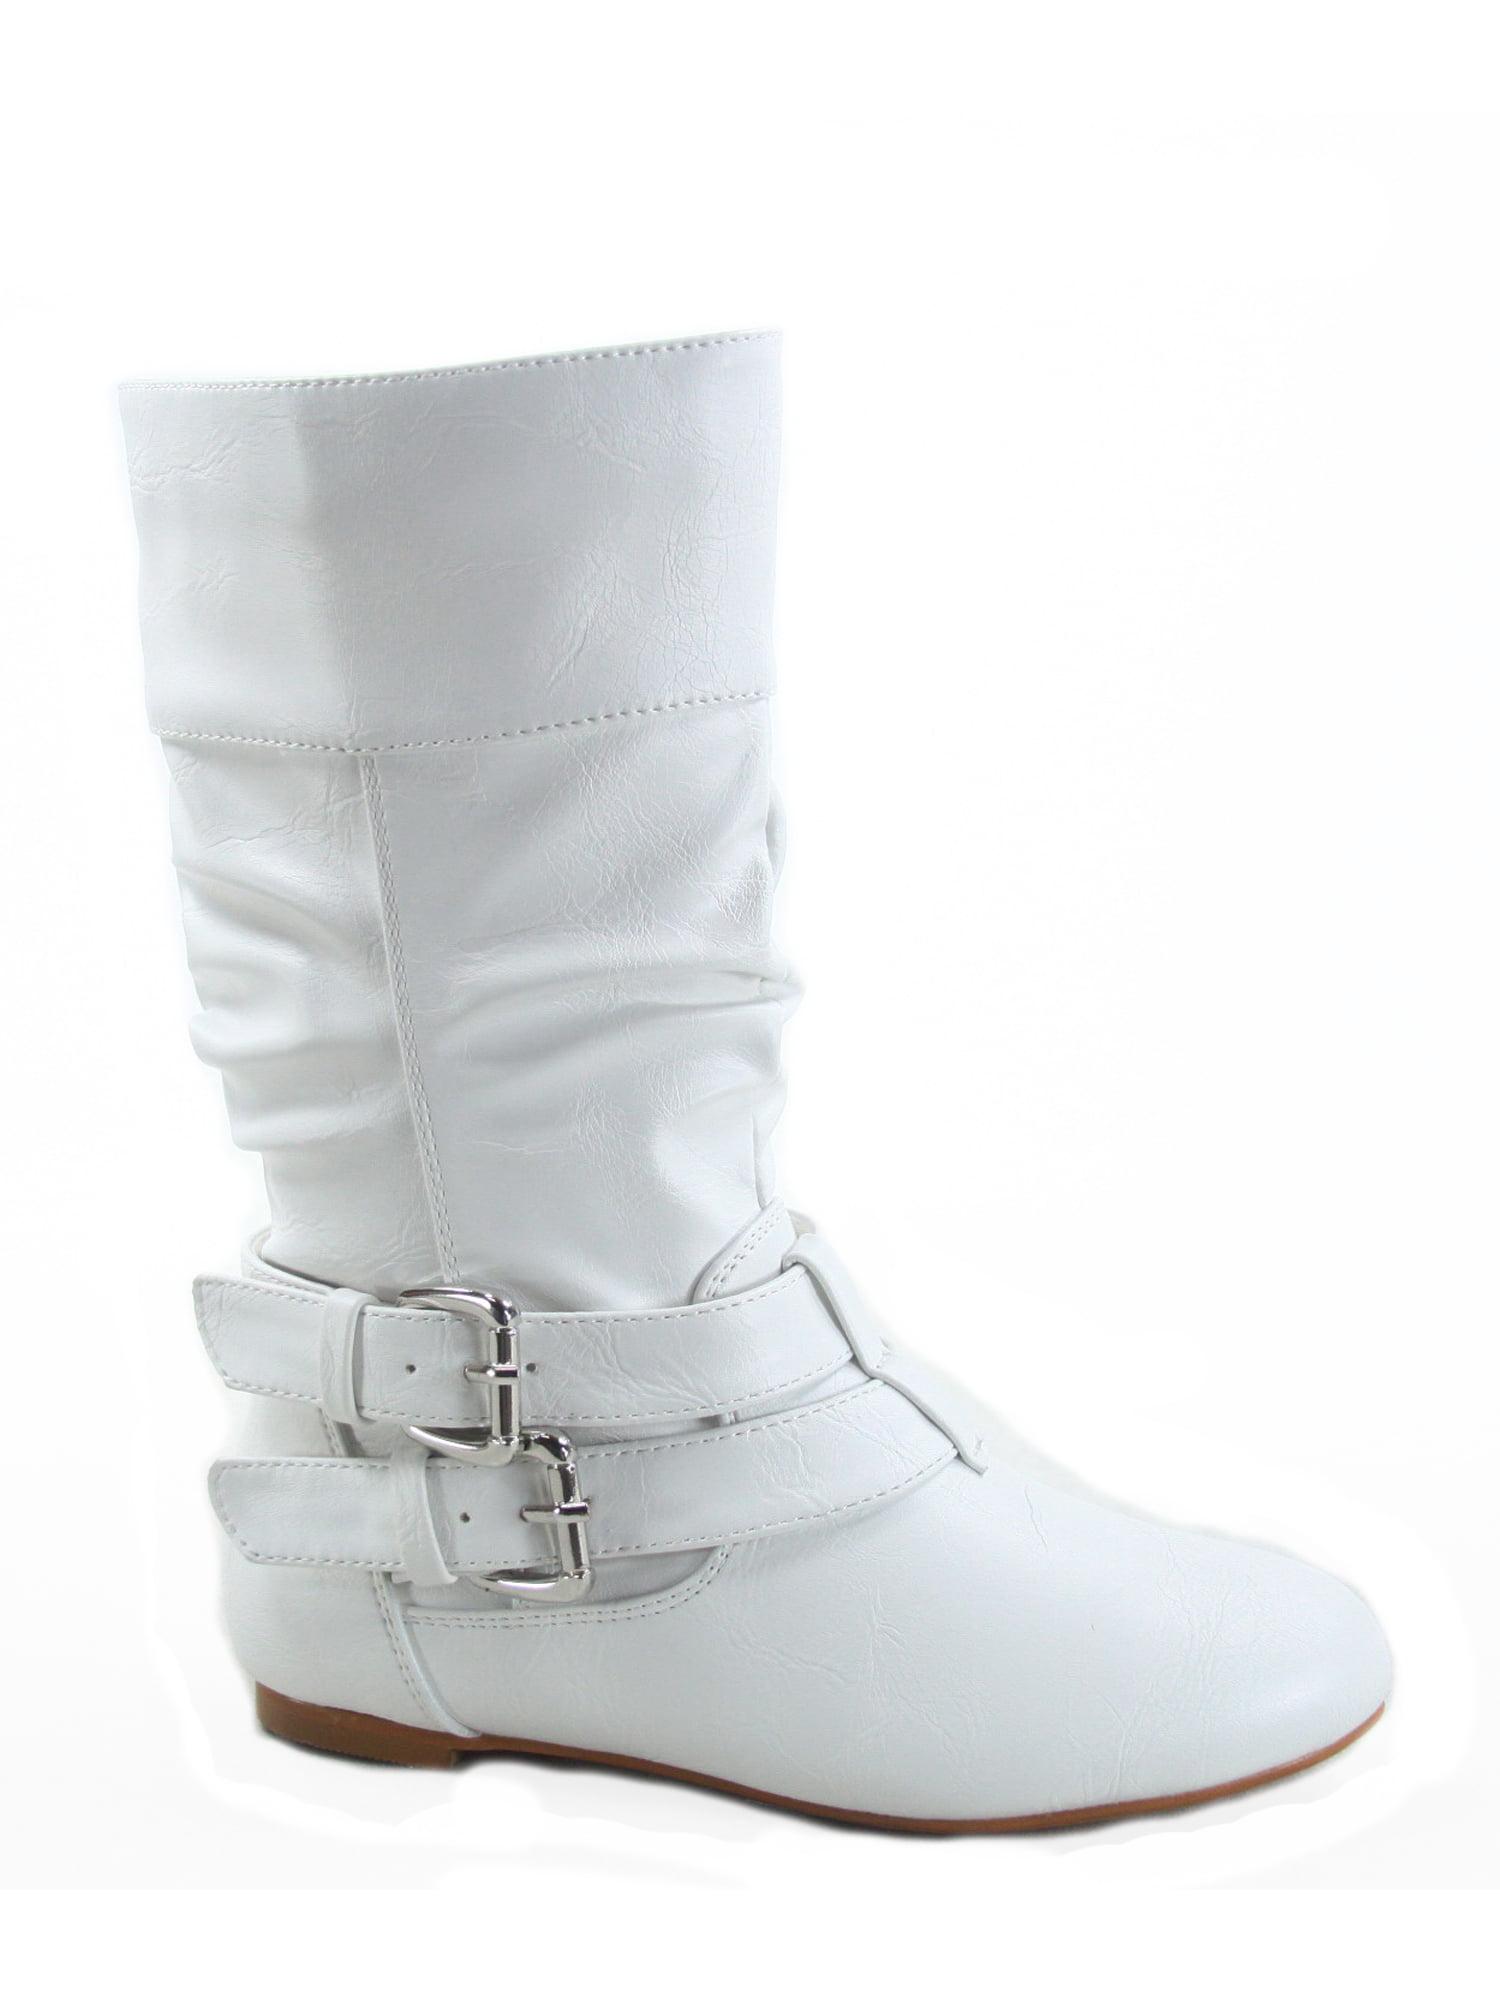 school boots shoes